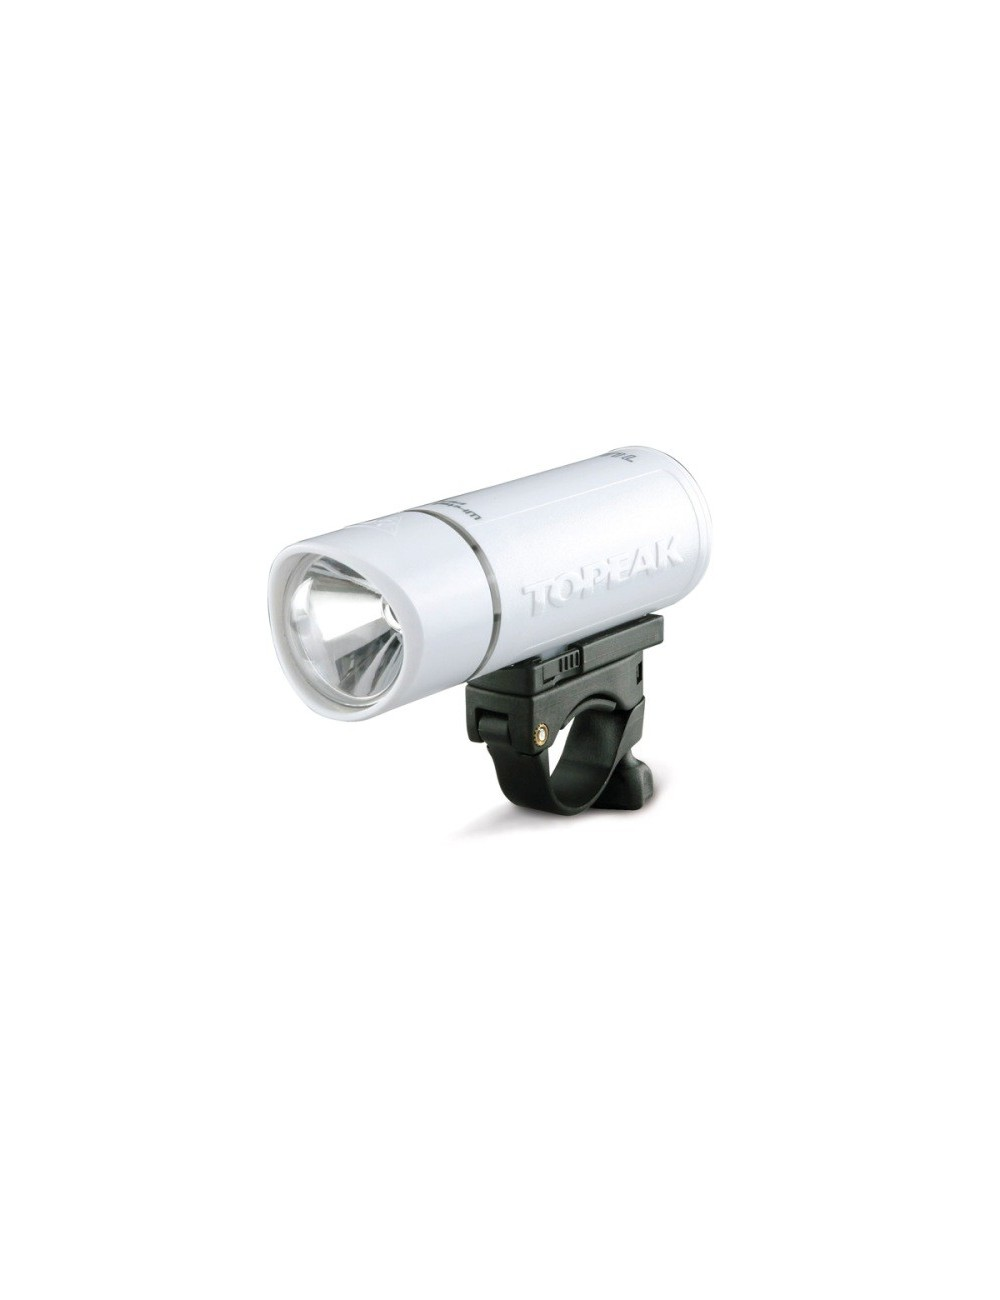 Lanterna Topeak White Lite HP 1W Branco